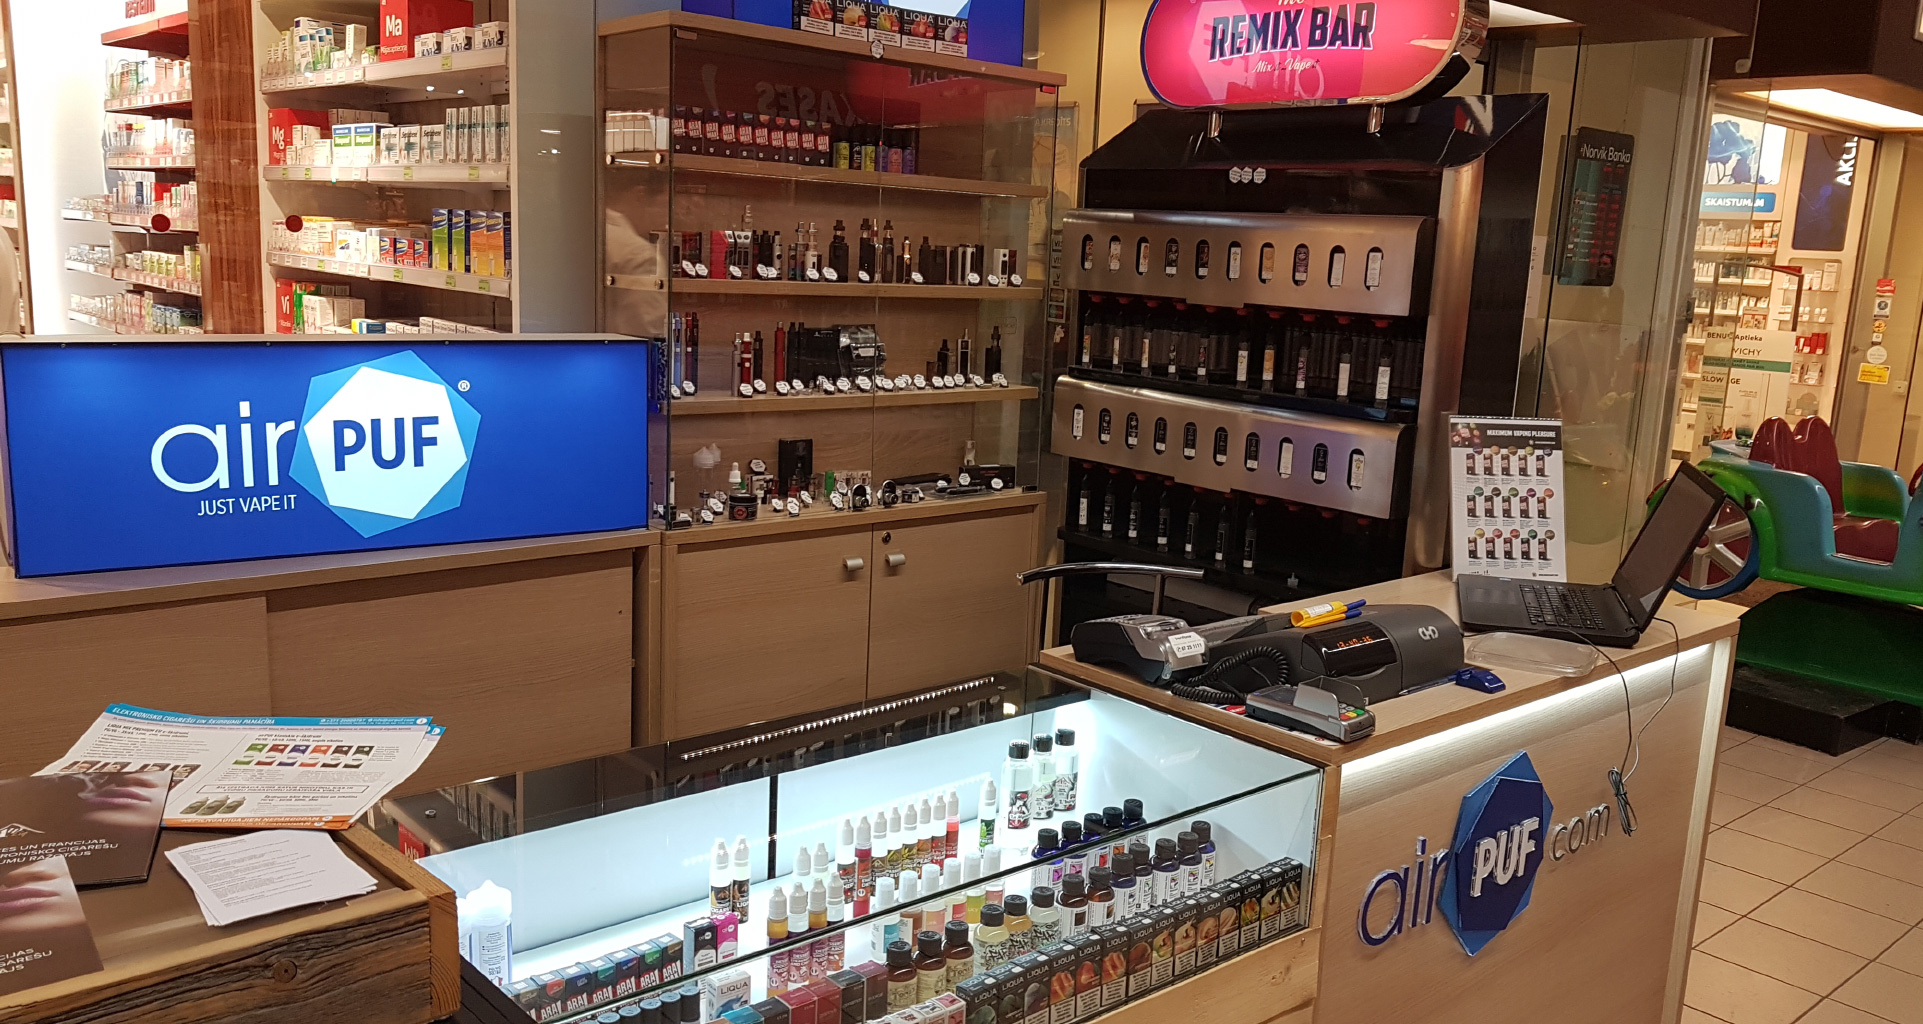 e-cigaretes spice, elektroniskās cigaretes, e-šķidrumi pārdaugava, remixjuice, remixbar, airpuf